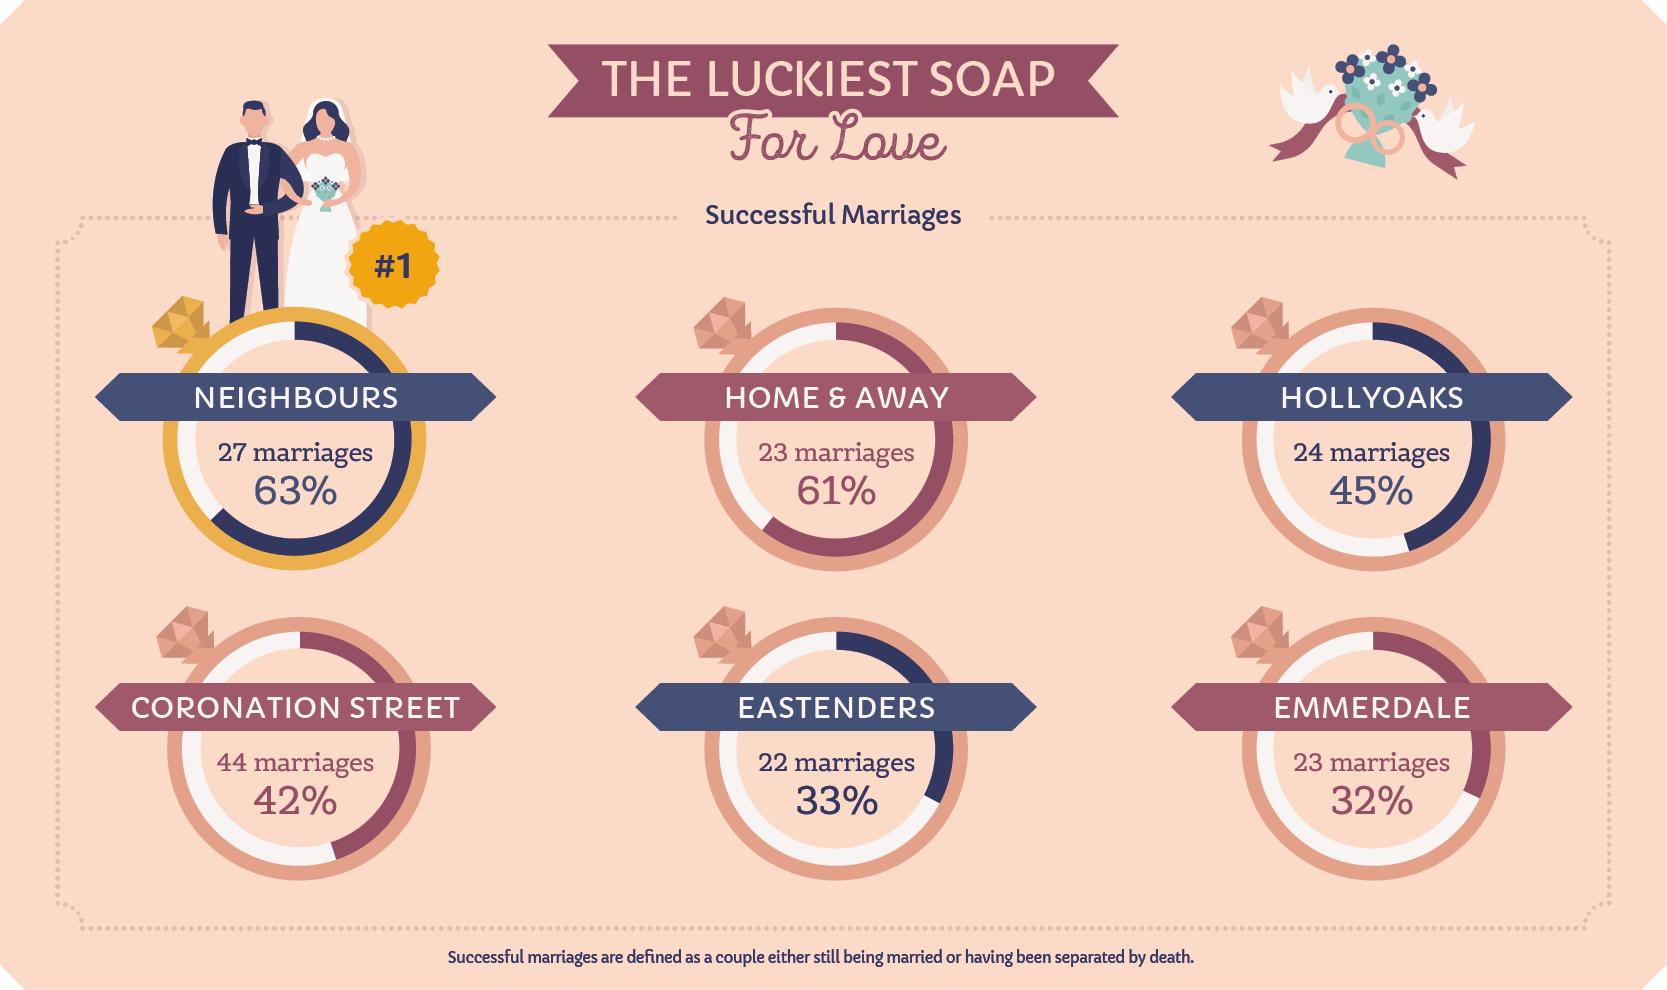 lucky soap love 1